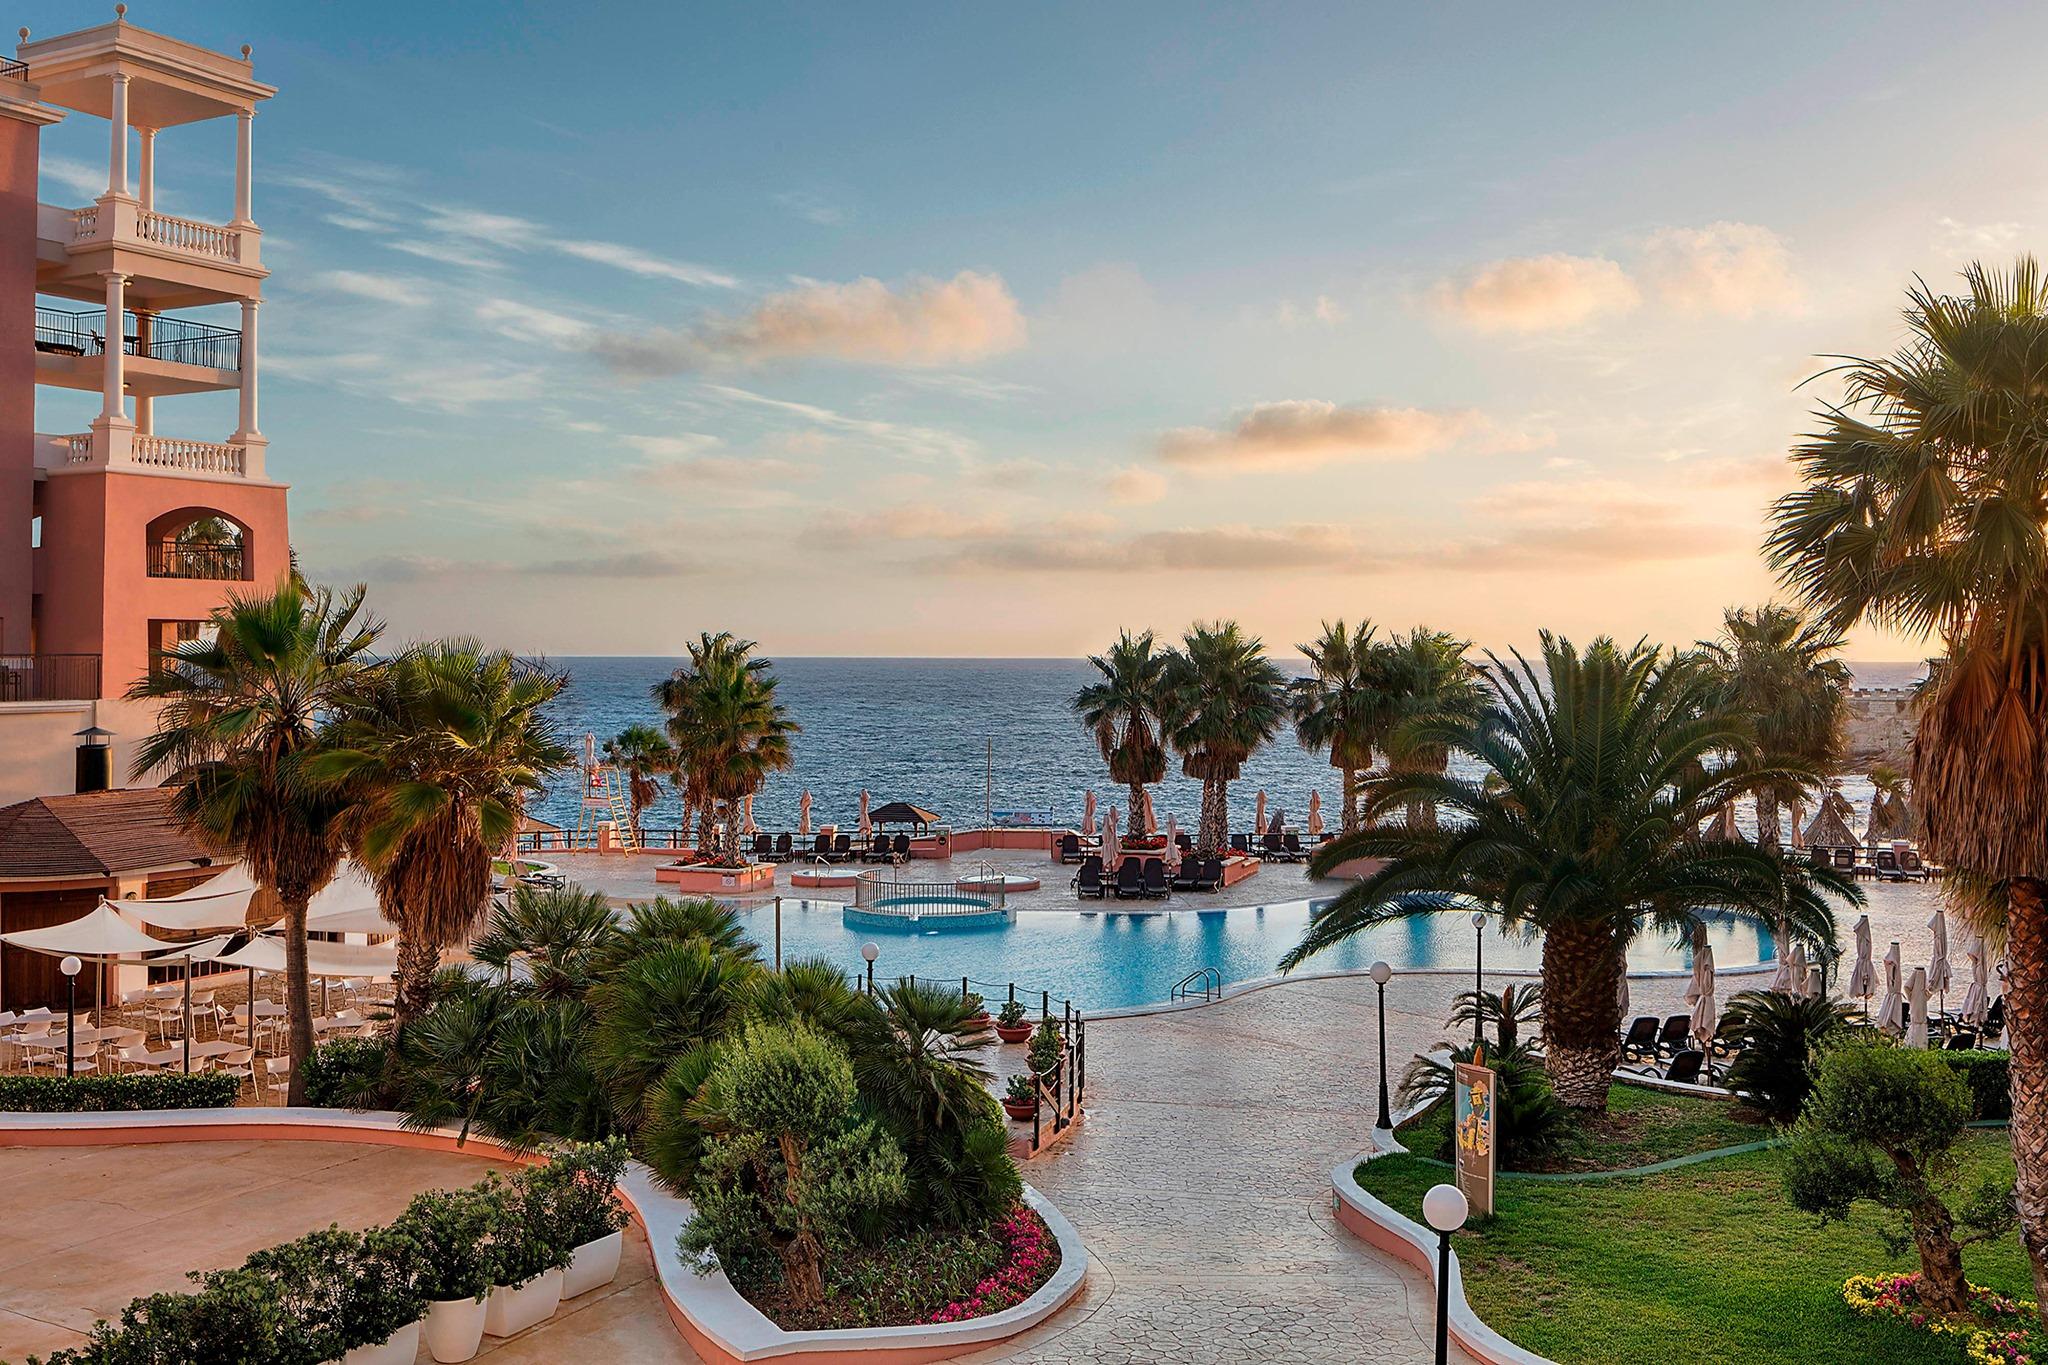 Westin Dragonara Resort awarded 'Superior' label by the Malta Tourism Authority